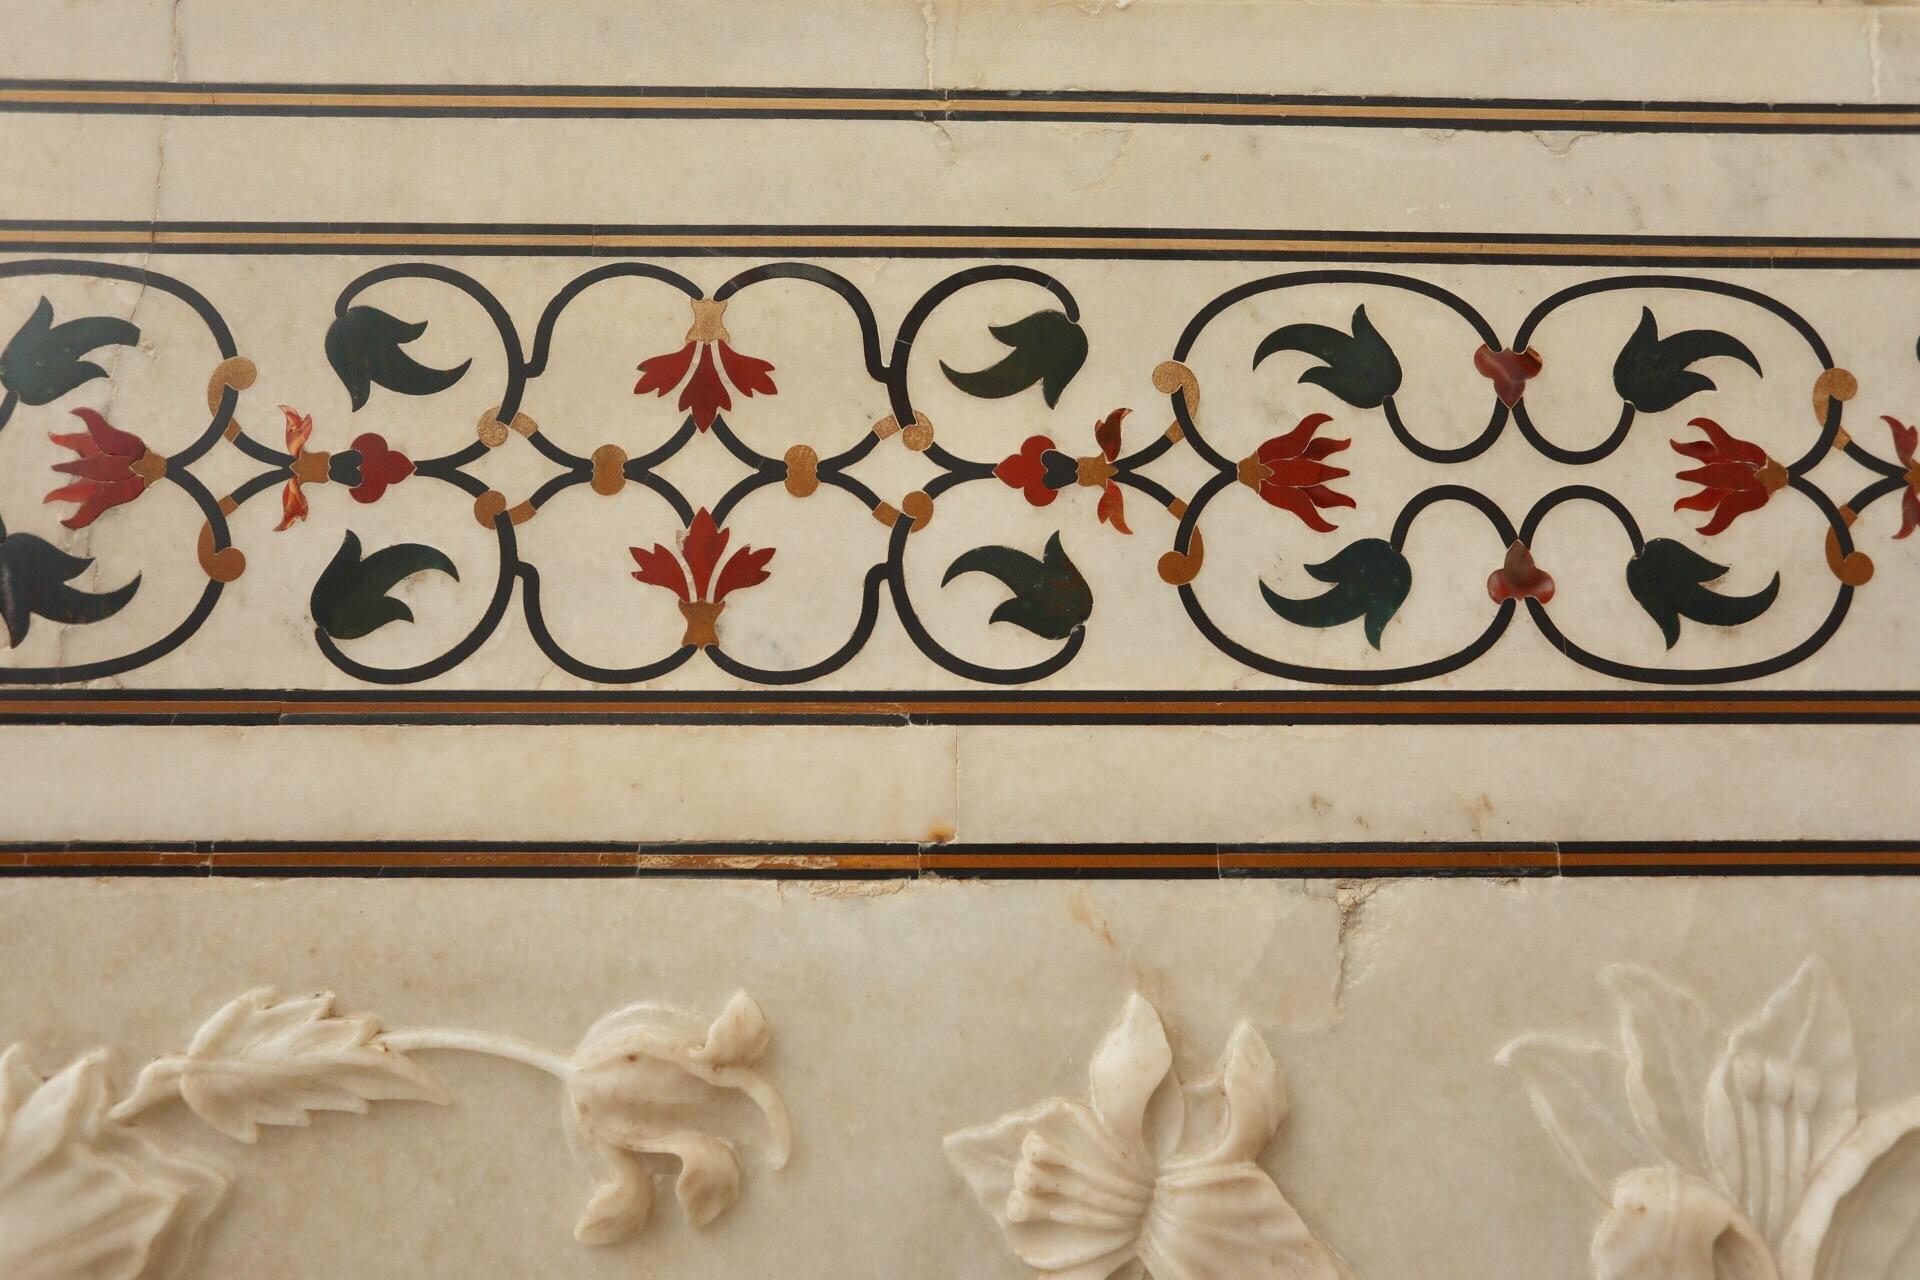 Inlaid stones include jade, jasper, lapis lazuli, onyx, orange carnelian, agates bloodstone & garnet